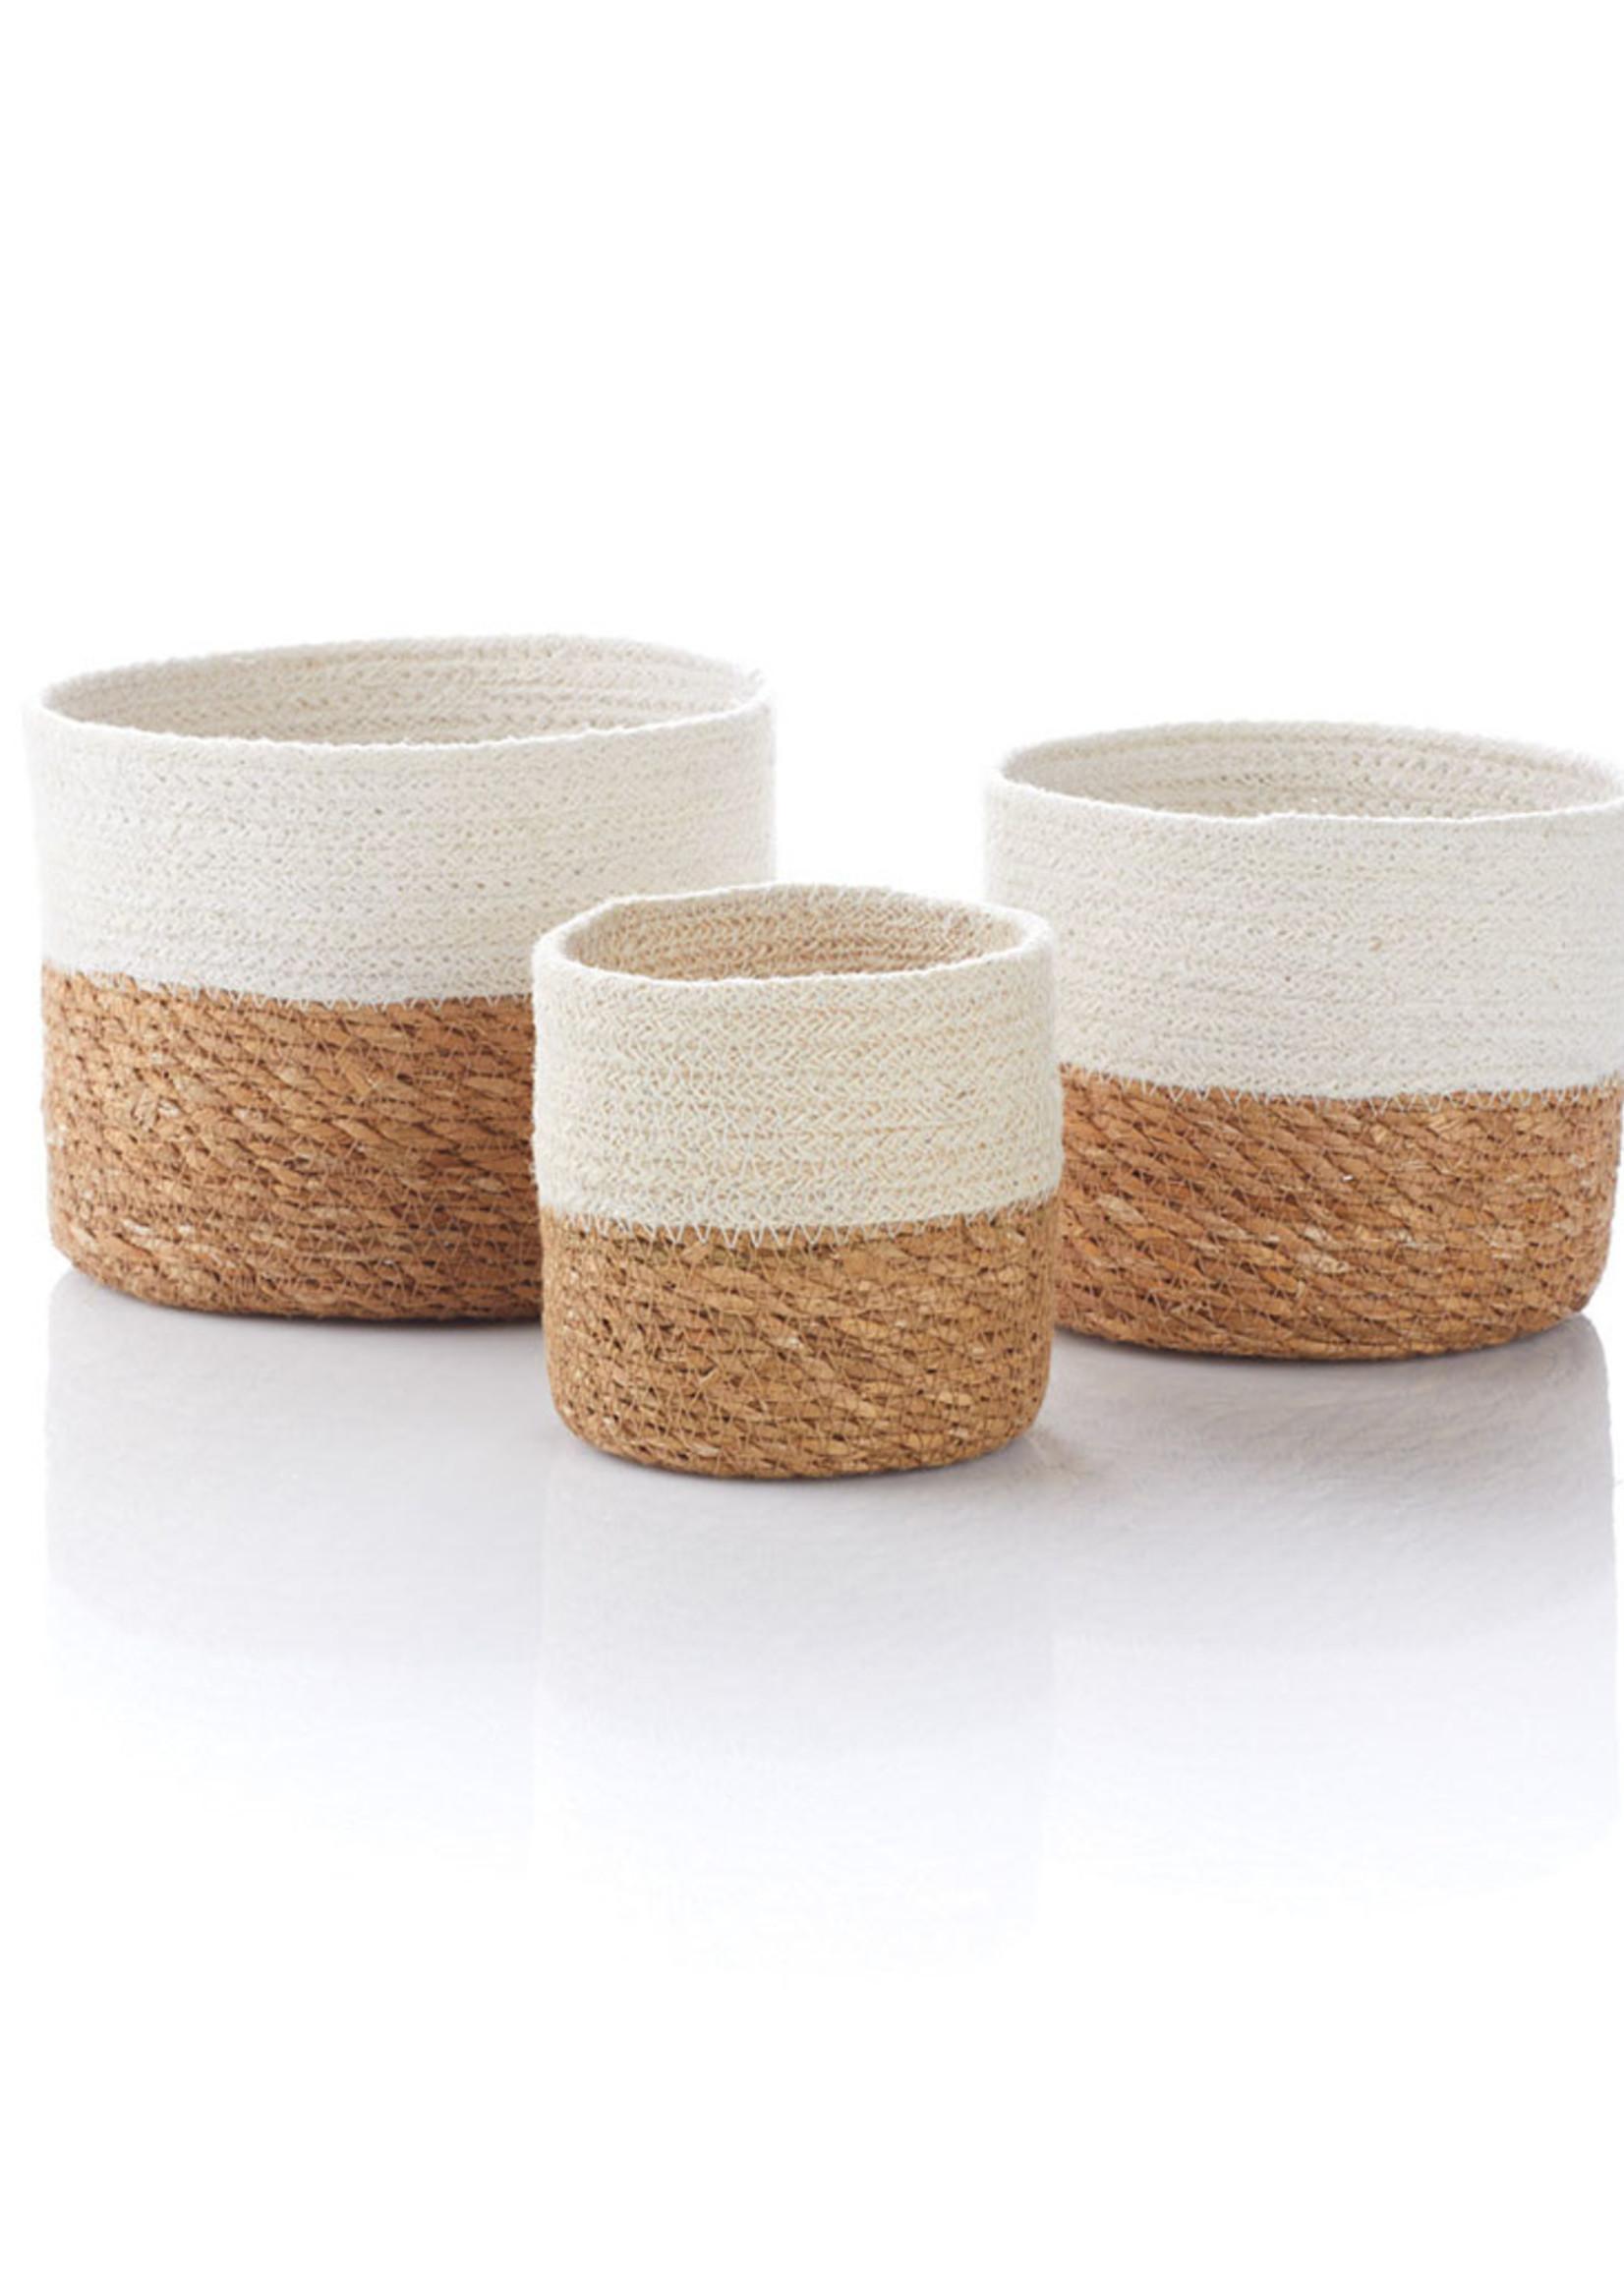 Samadra Sands Nesting Baskets [Set of 3]